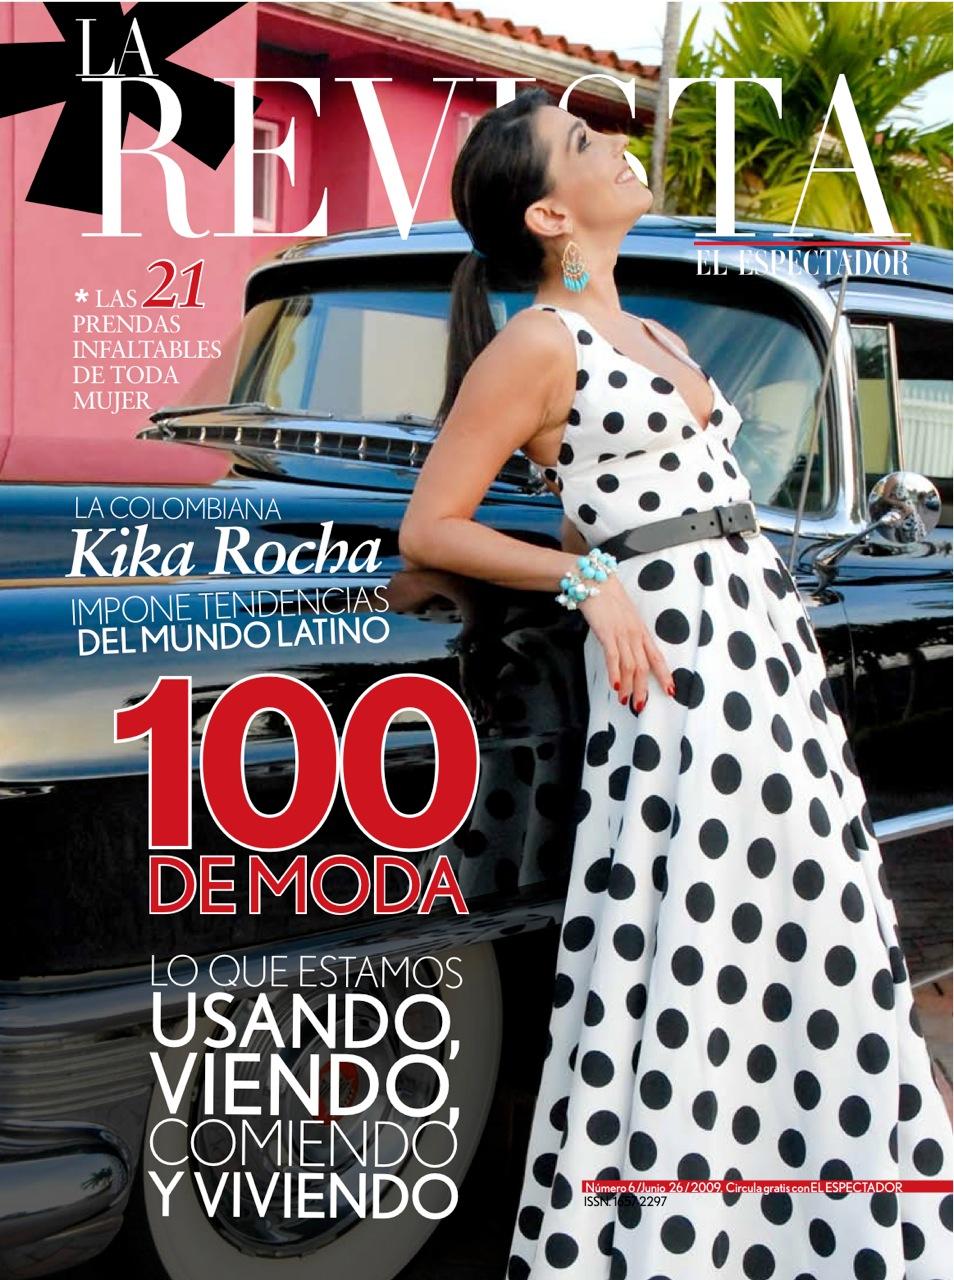 001  La Revista El Espectador .jpg